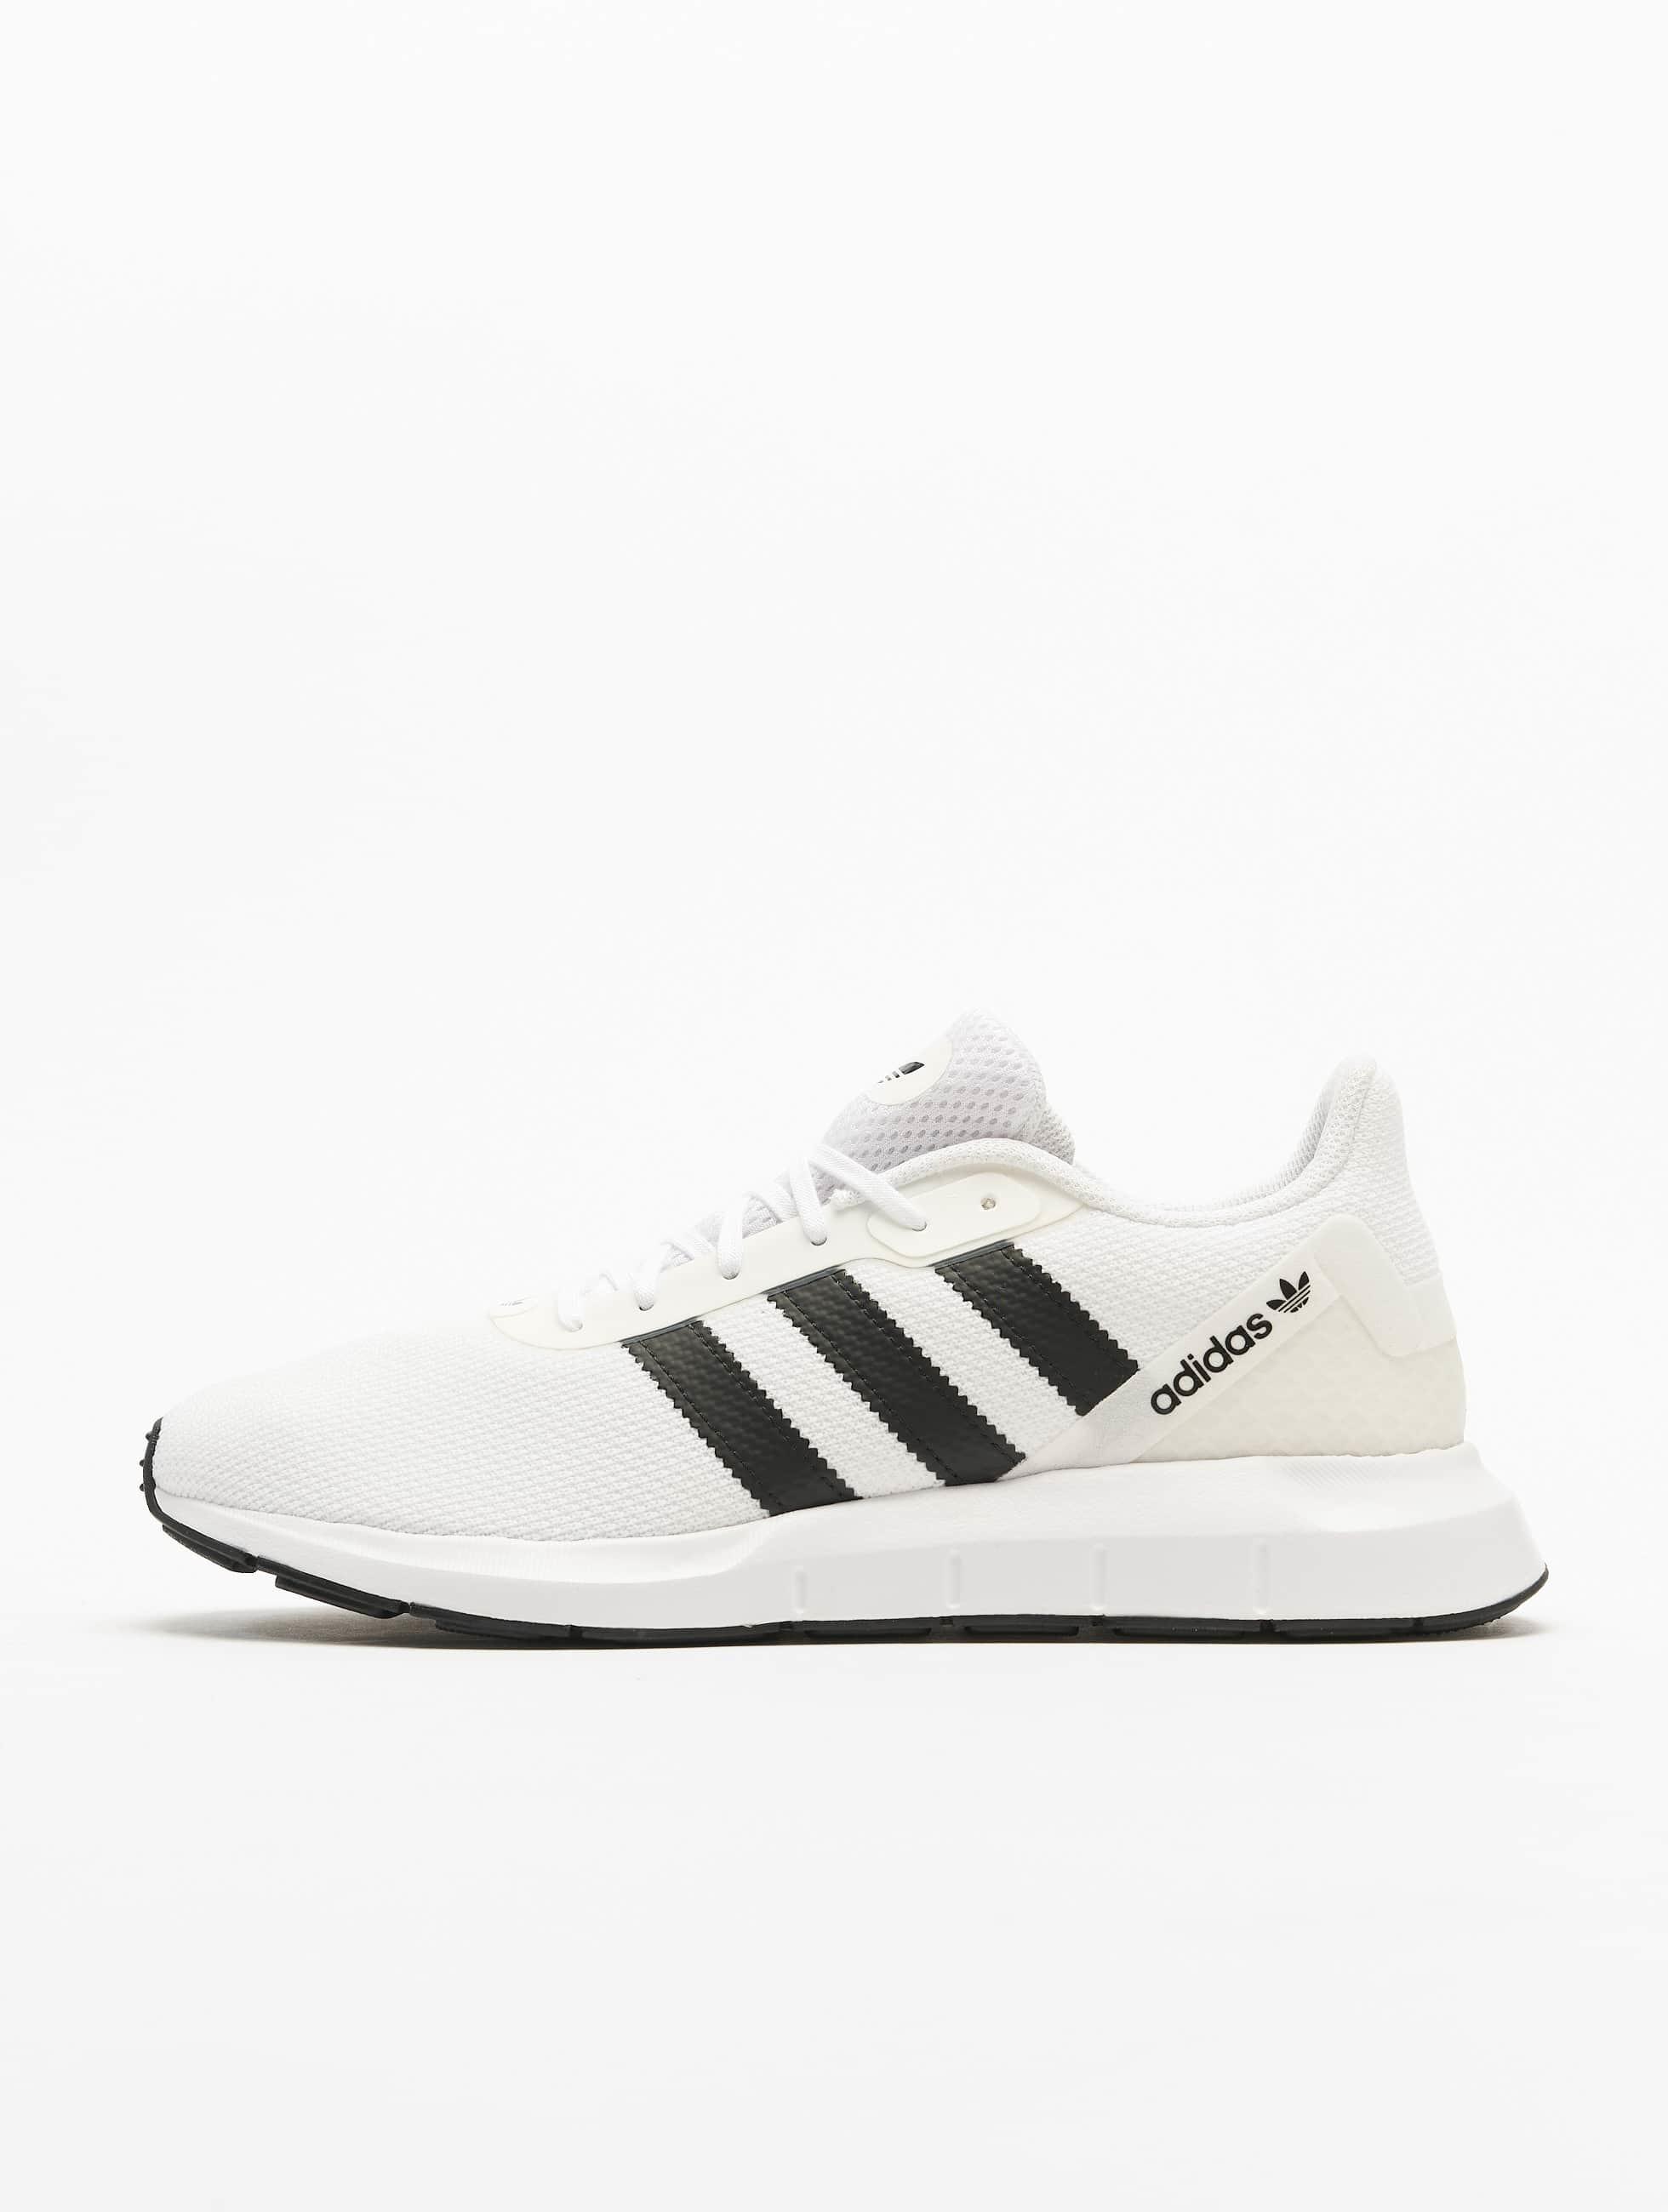 Adidas Originals Swift Run RF Sneakers Ftwr WhiteCore BlackFtwr White